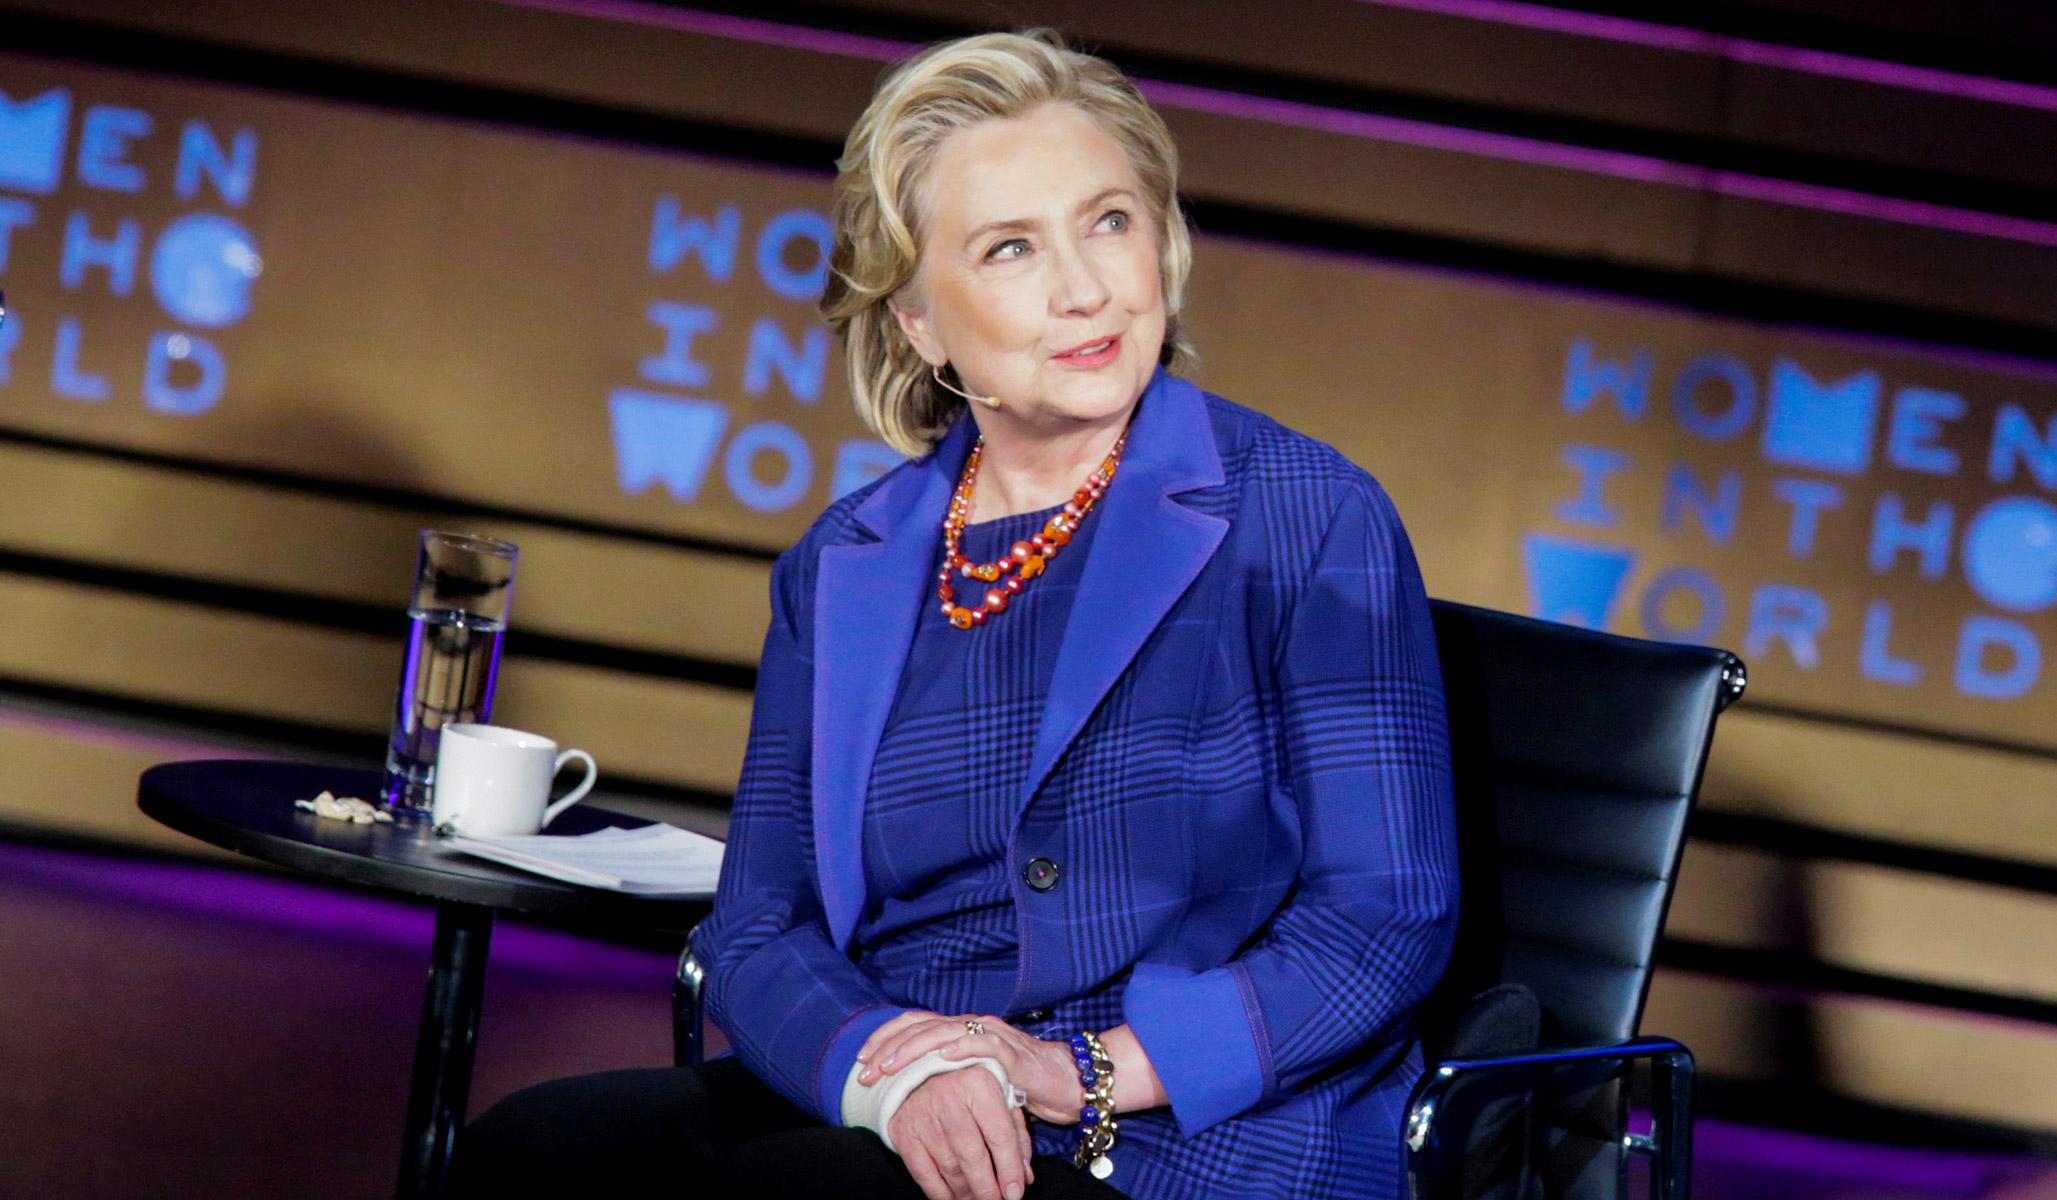 Hillary Clinton Slams 'Authoritarian' and 'Trumpian' Zuckerberg over Facebook's Speech Stance